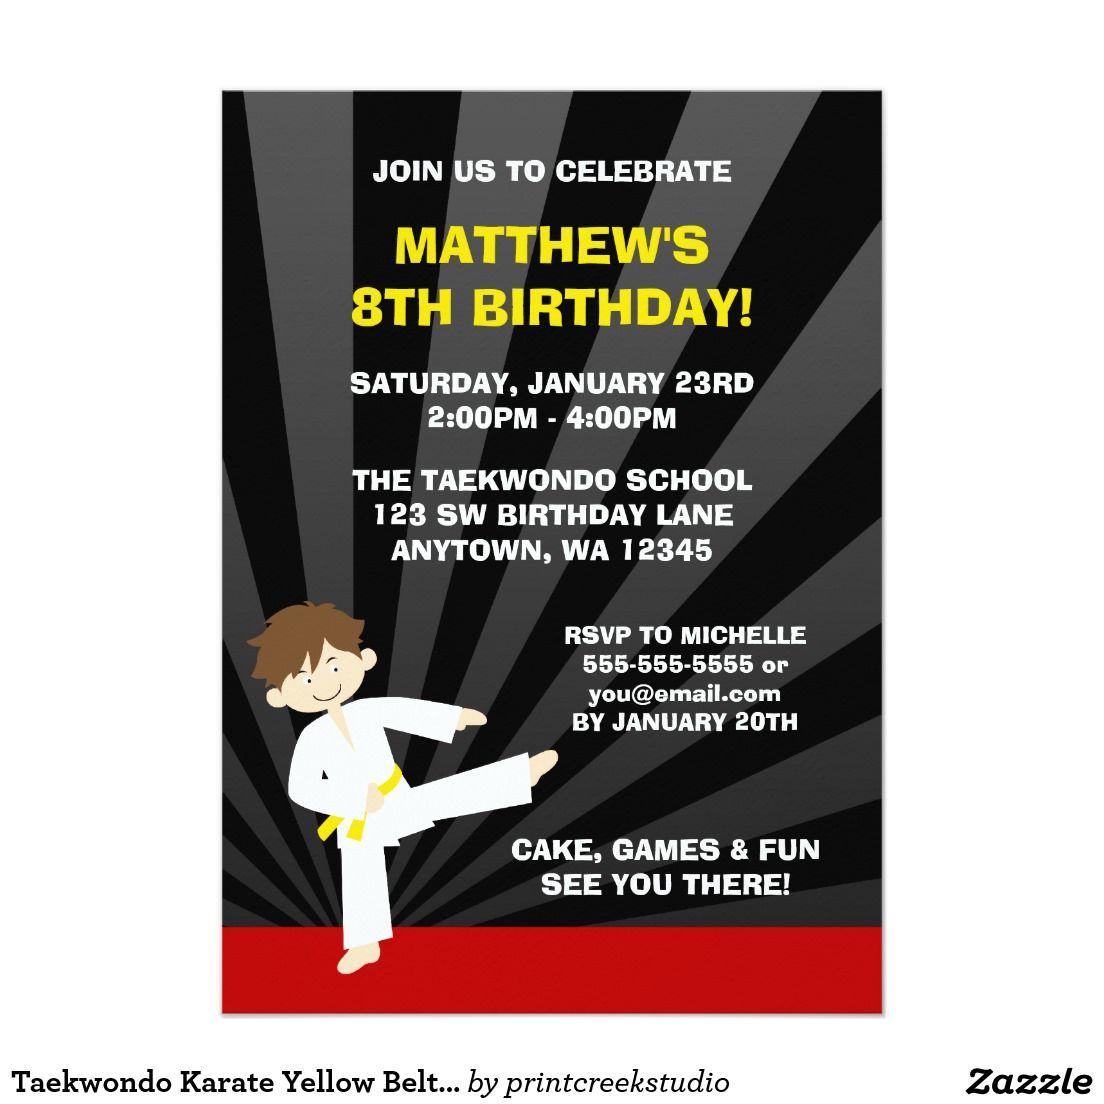 Taekwondo Karate Yellow Belt Birthday Invitations | BOYS\' BIRTHDAY ...